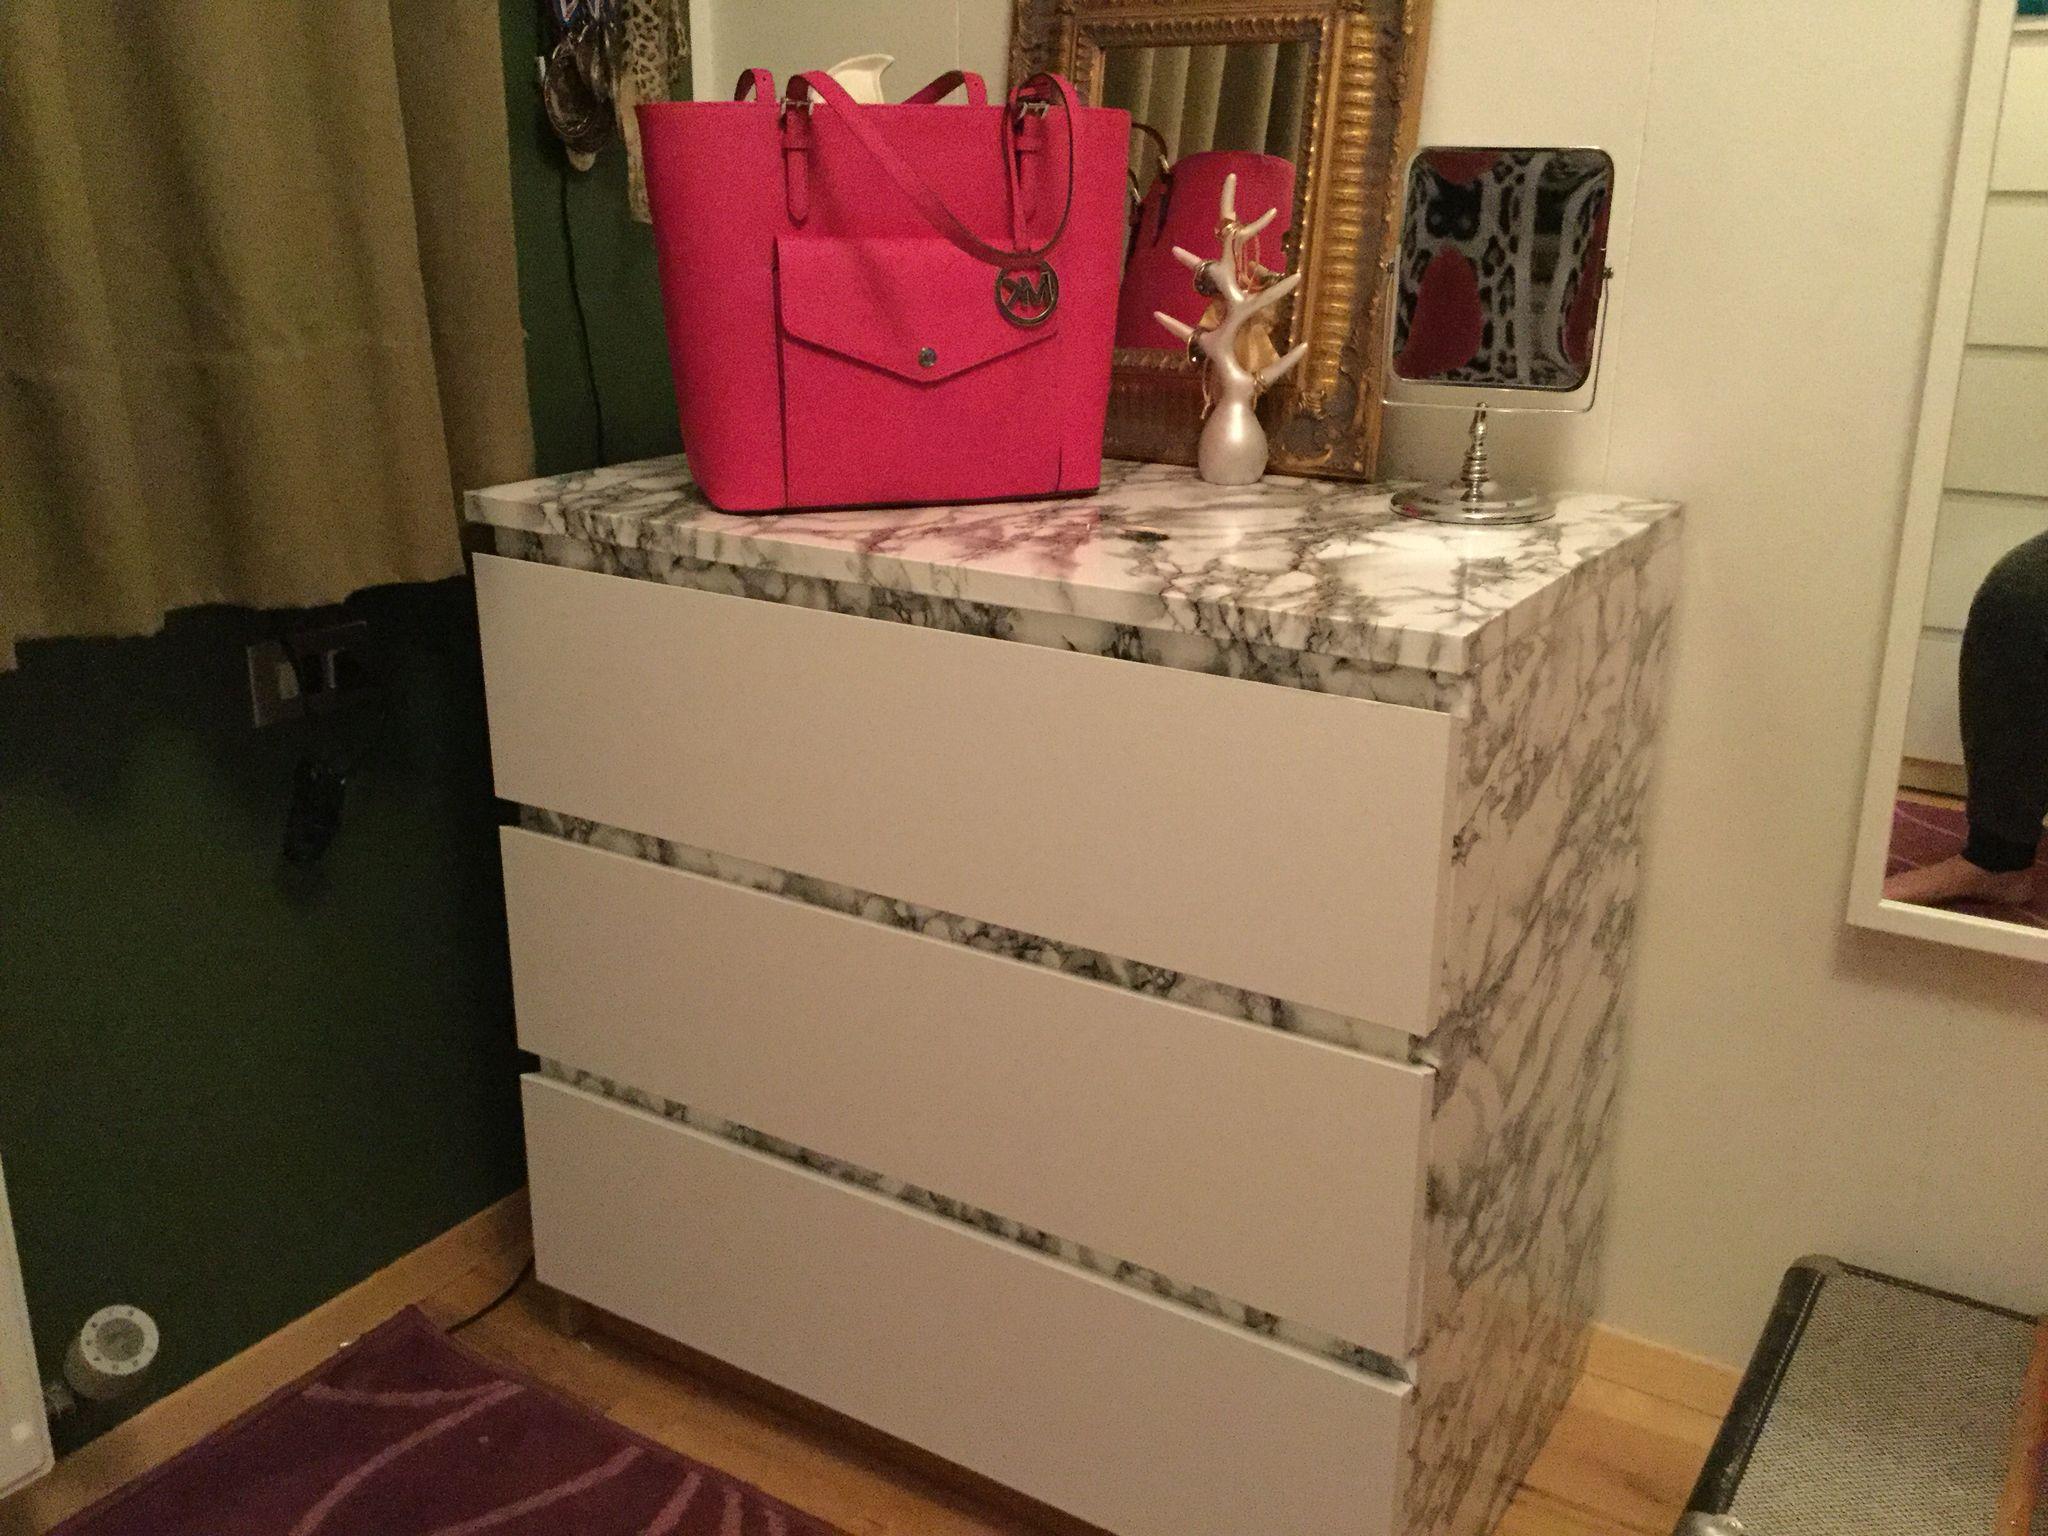 Cassettiera Ikea Malm Usata.Ikea Hack Malm Dresser With White And Marble Self Adhesive Paper